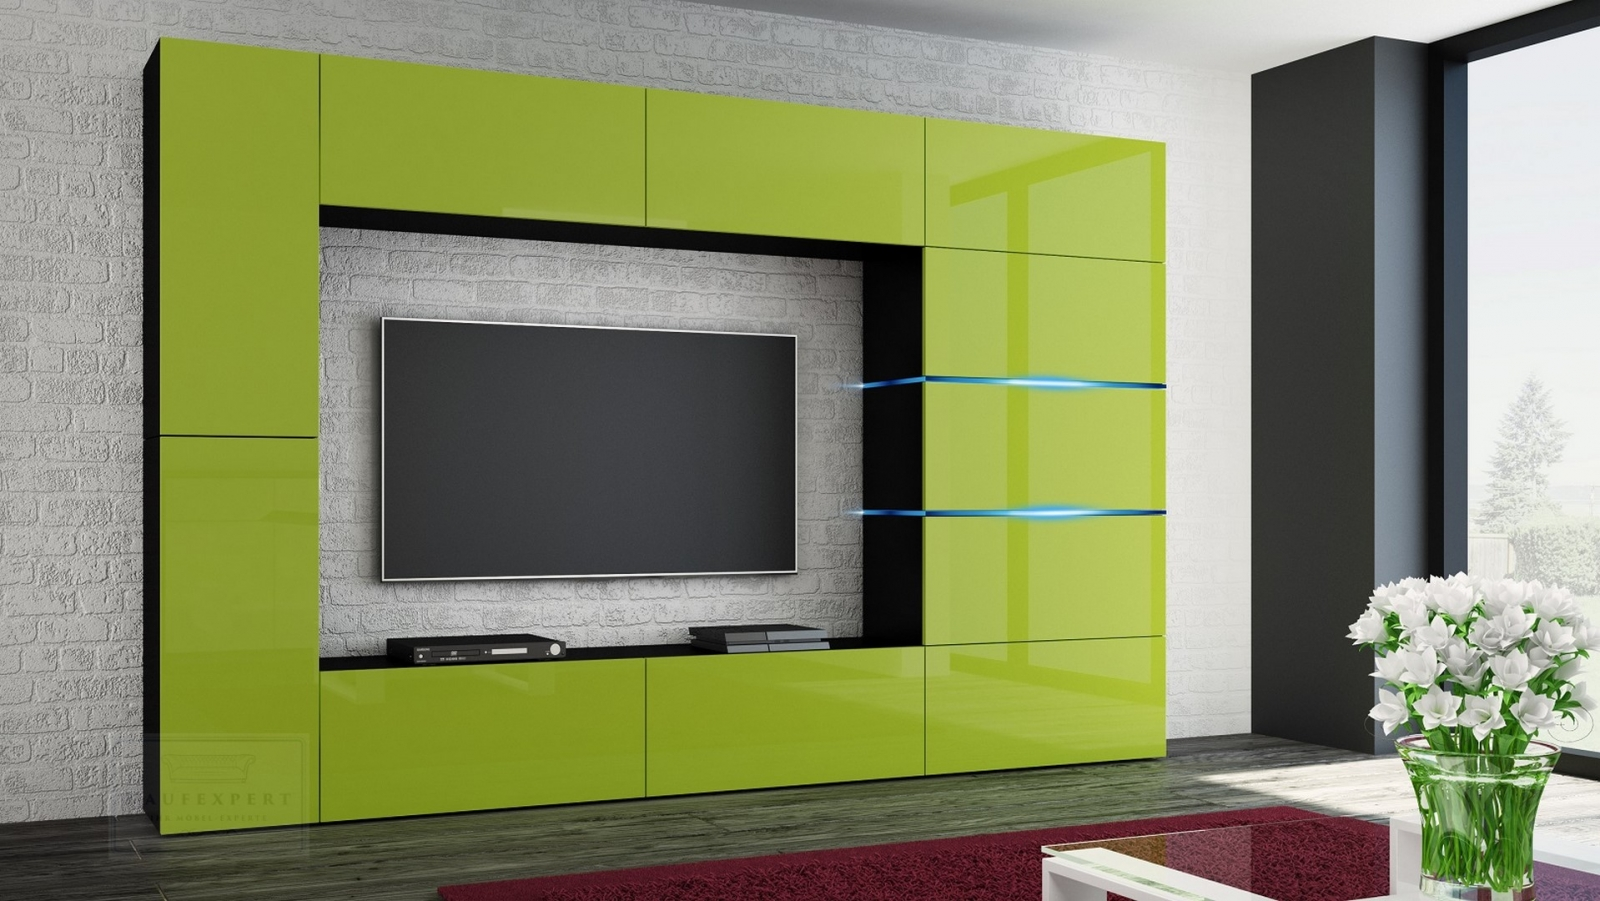 kaufexpert wohnwand shadow lime hochglanz schwarz 285 cm mediawand anbauwand medienwand design. Black Bedroom Furniture Sets. Home Design Ideas